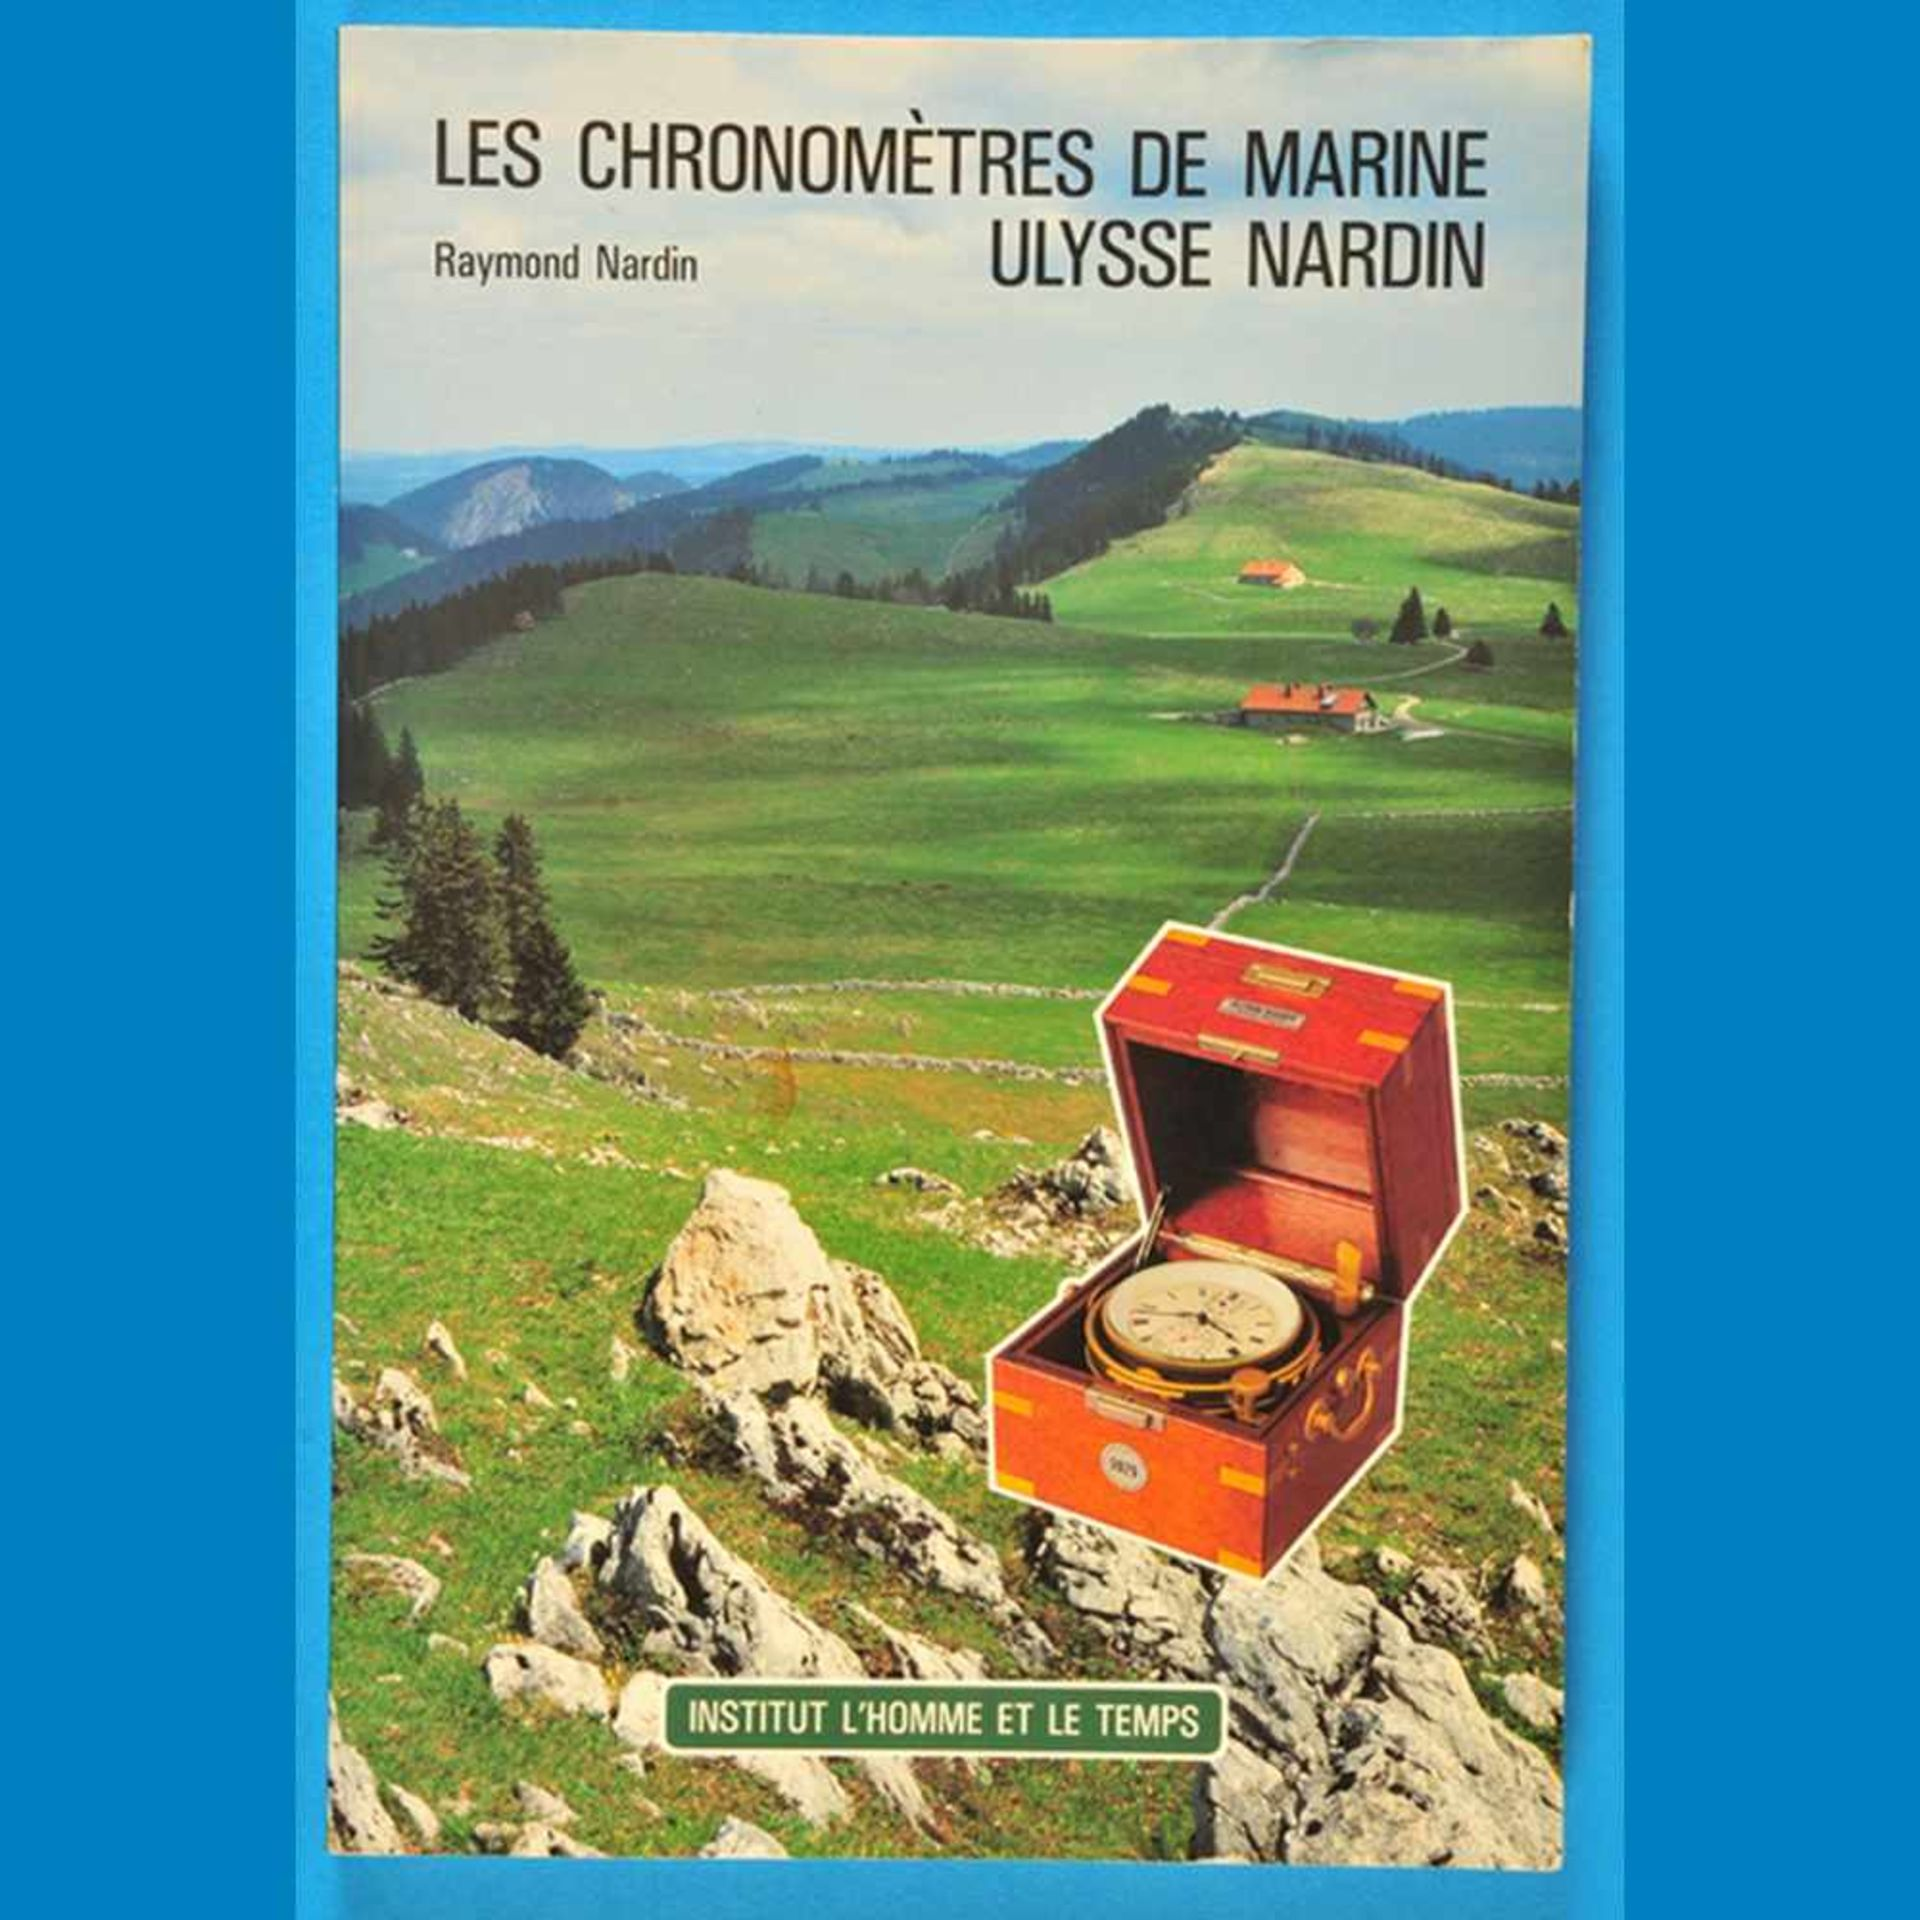 Raymond Nardin, Les Chronomètres de Marine Ulysse Nardin, 1876-1918, 1994Raymond Nardin, Le